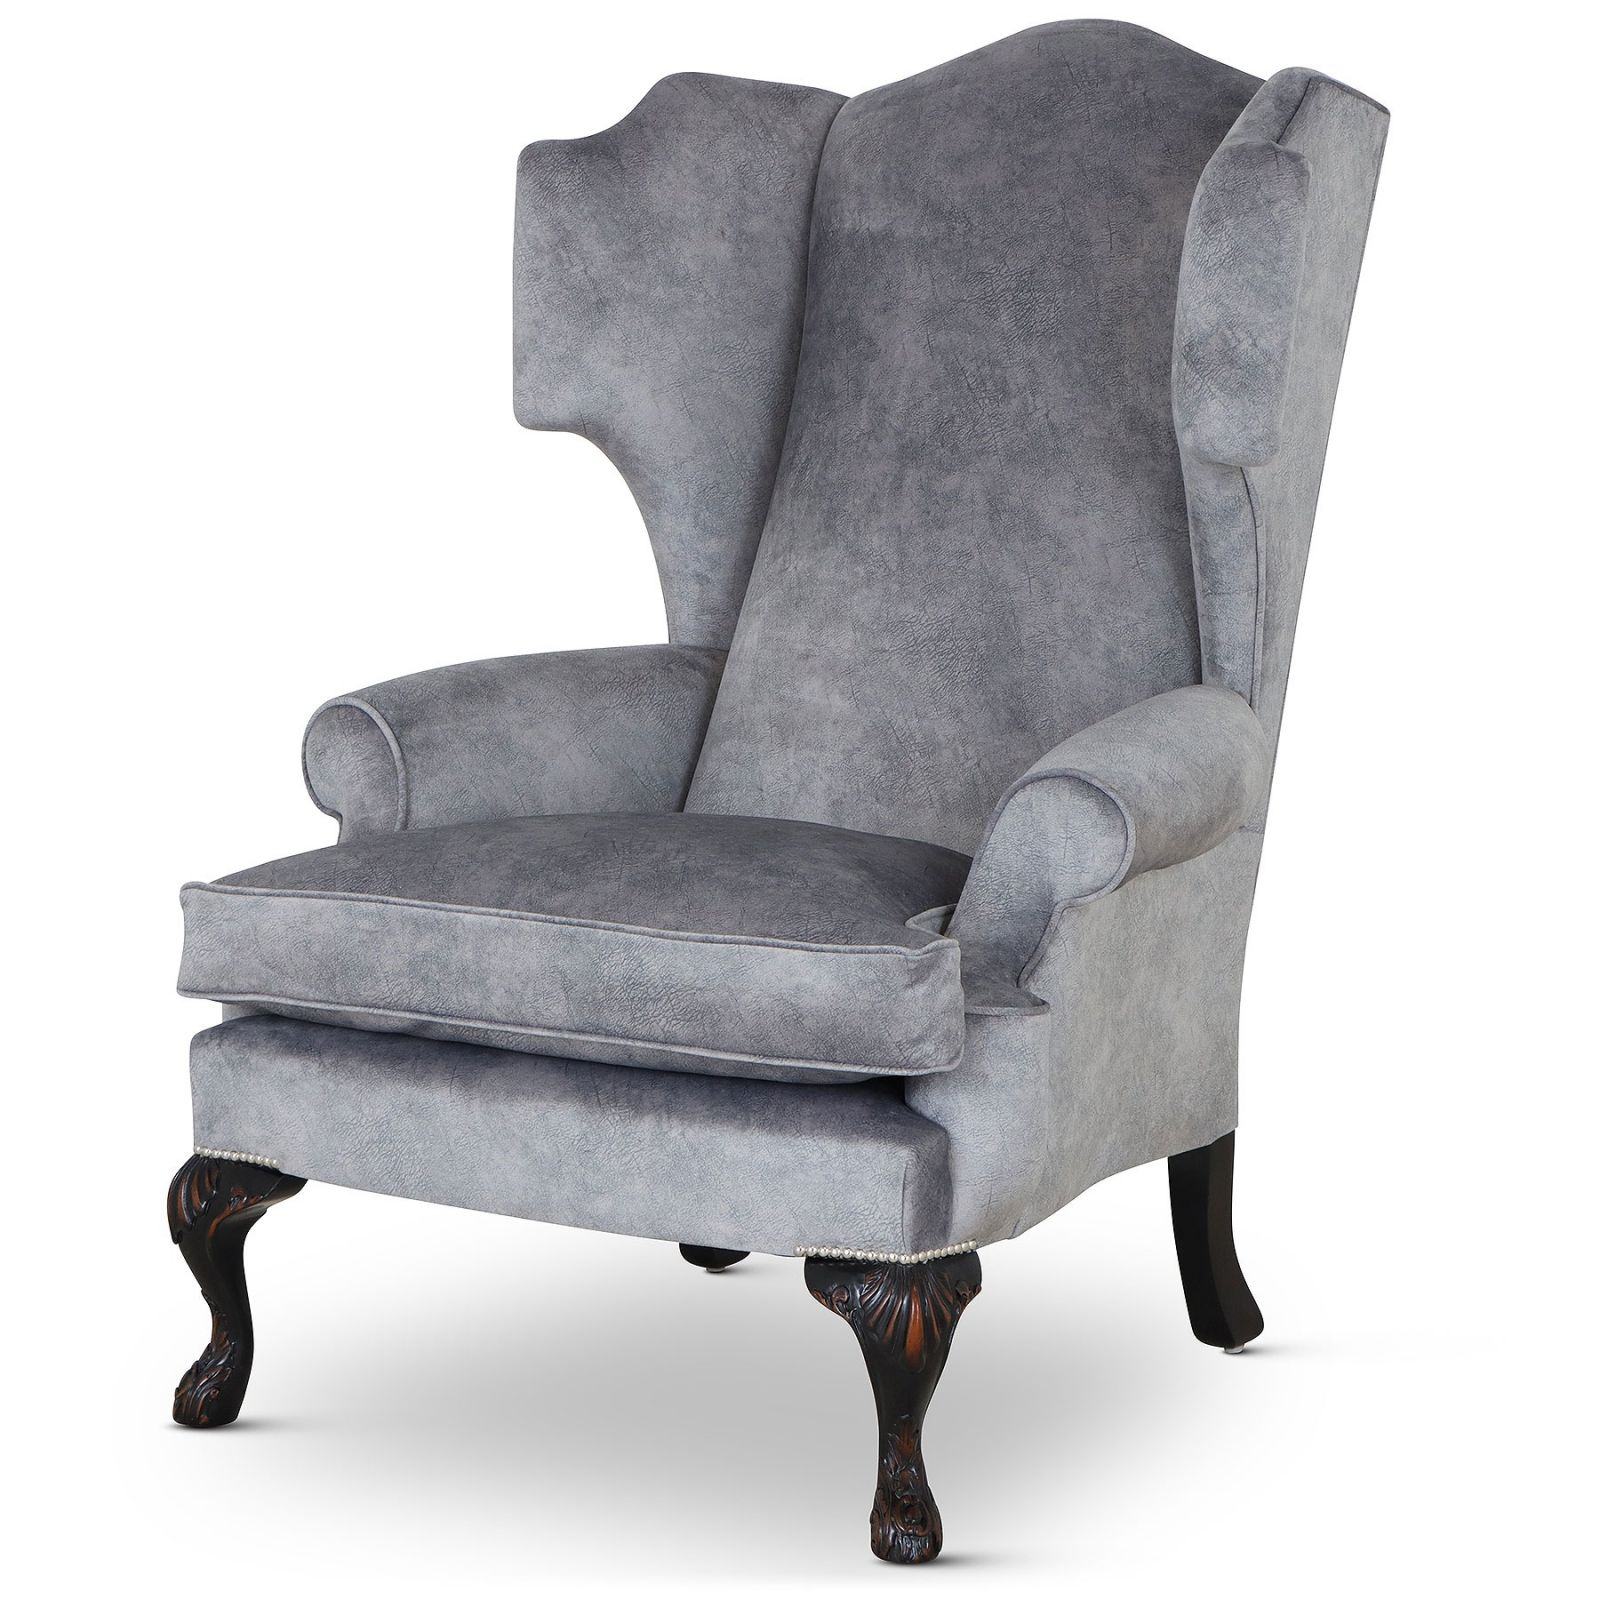 Elizabethan wing chair